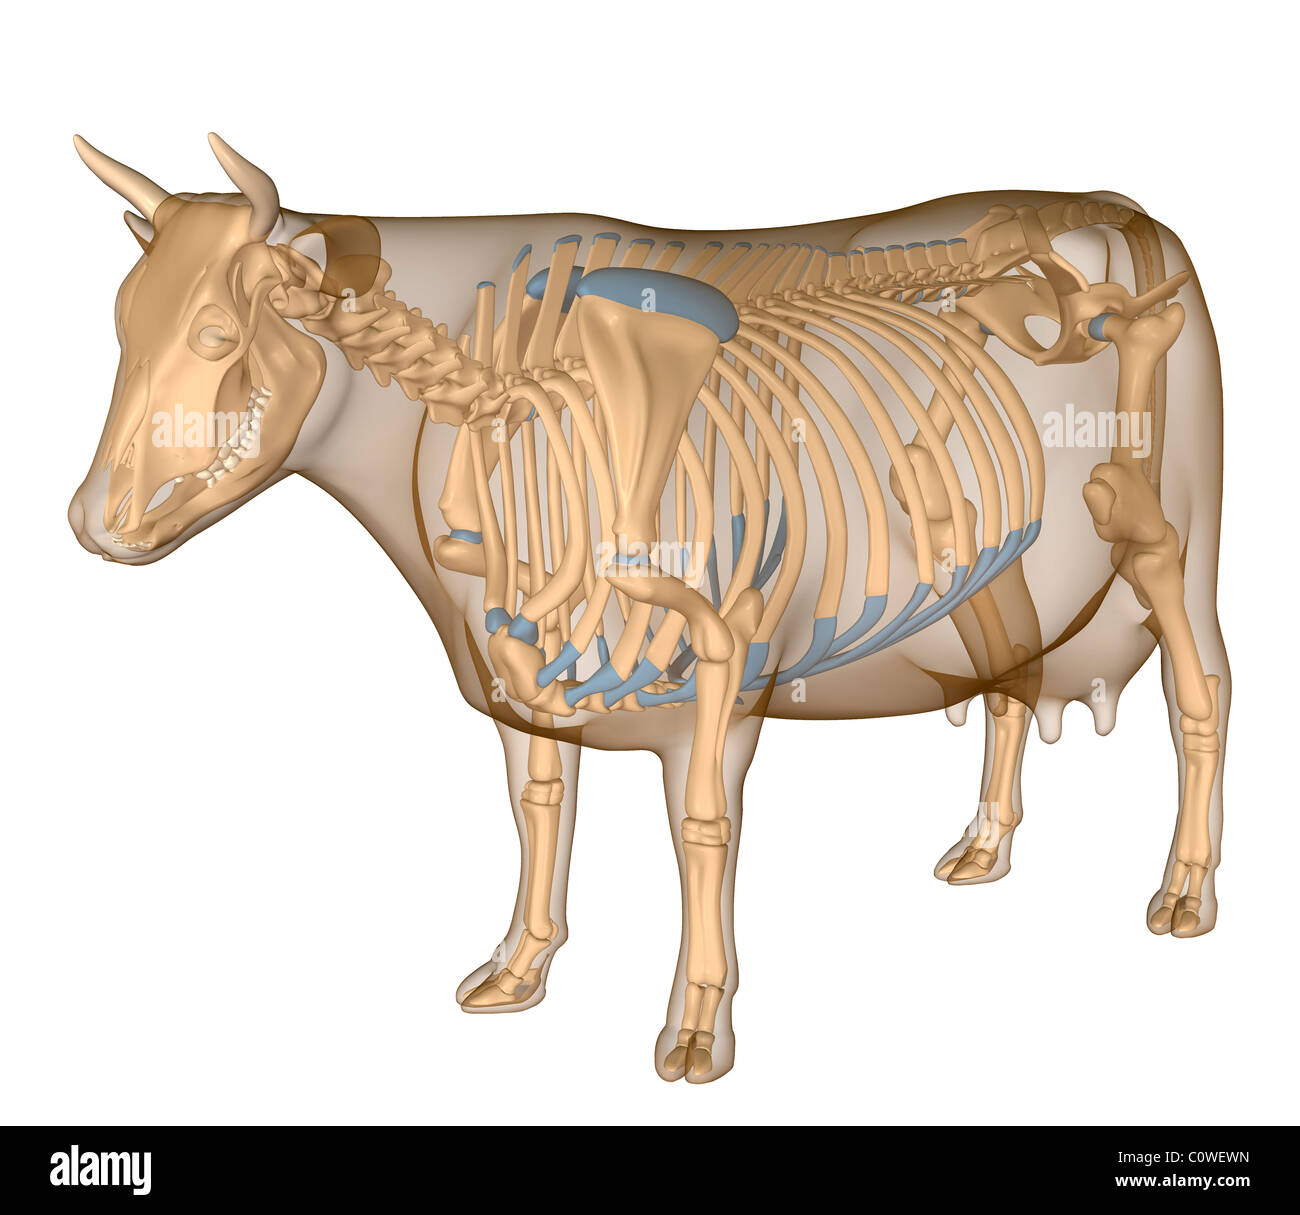 Anatomie des Skeletts Kuh Stockfoto, Bild: 34981233 - Alamy